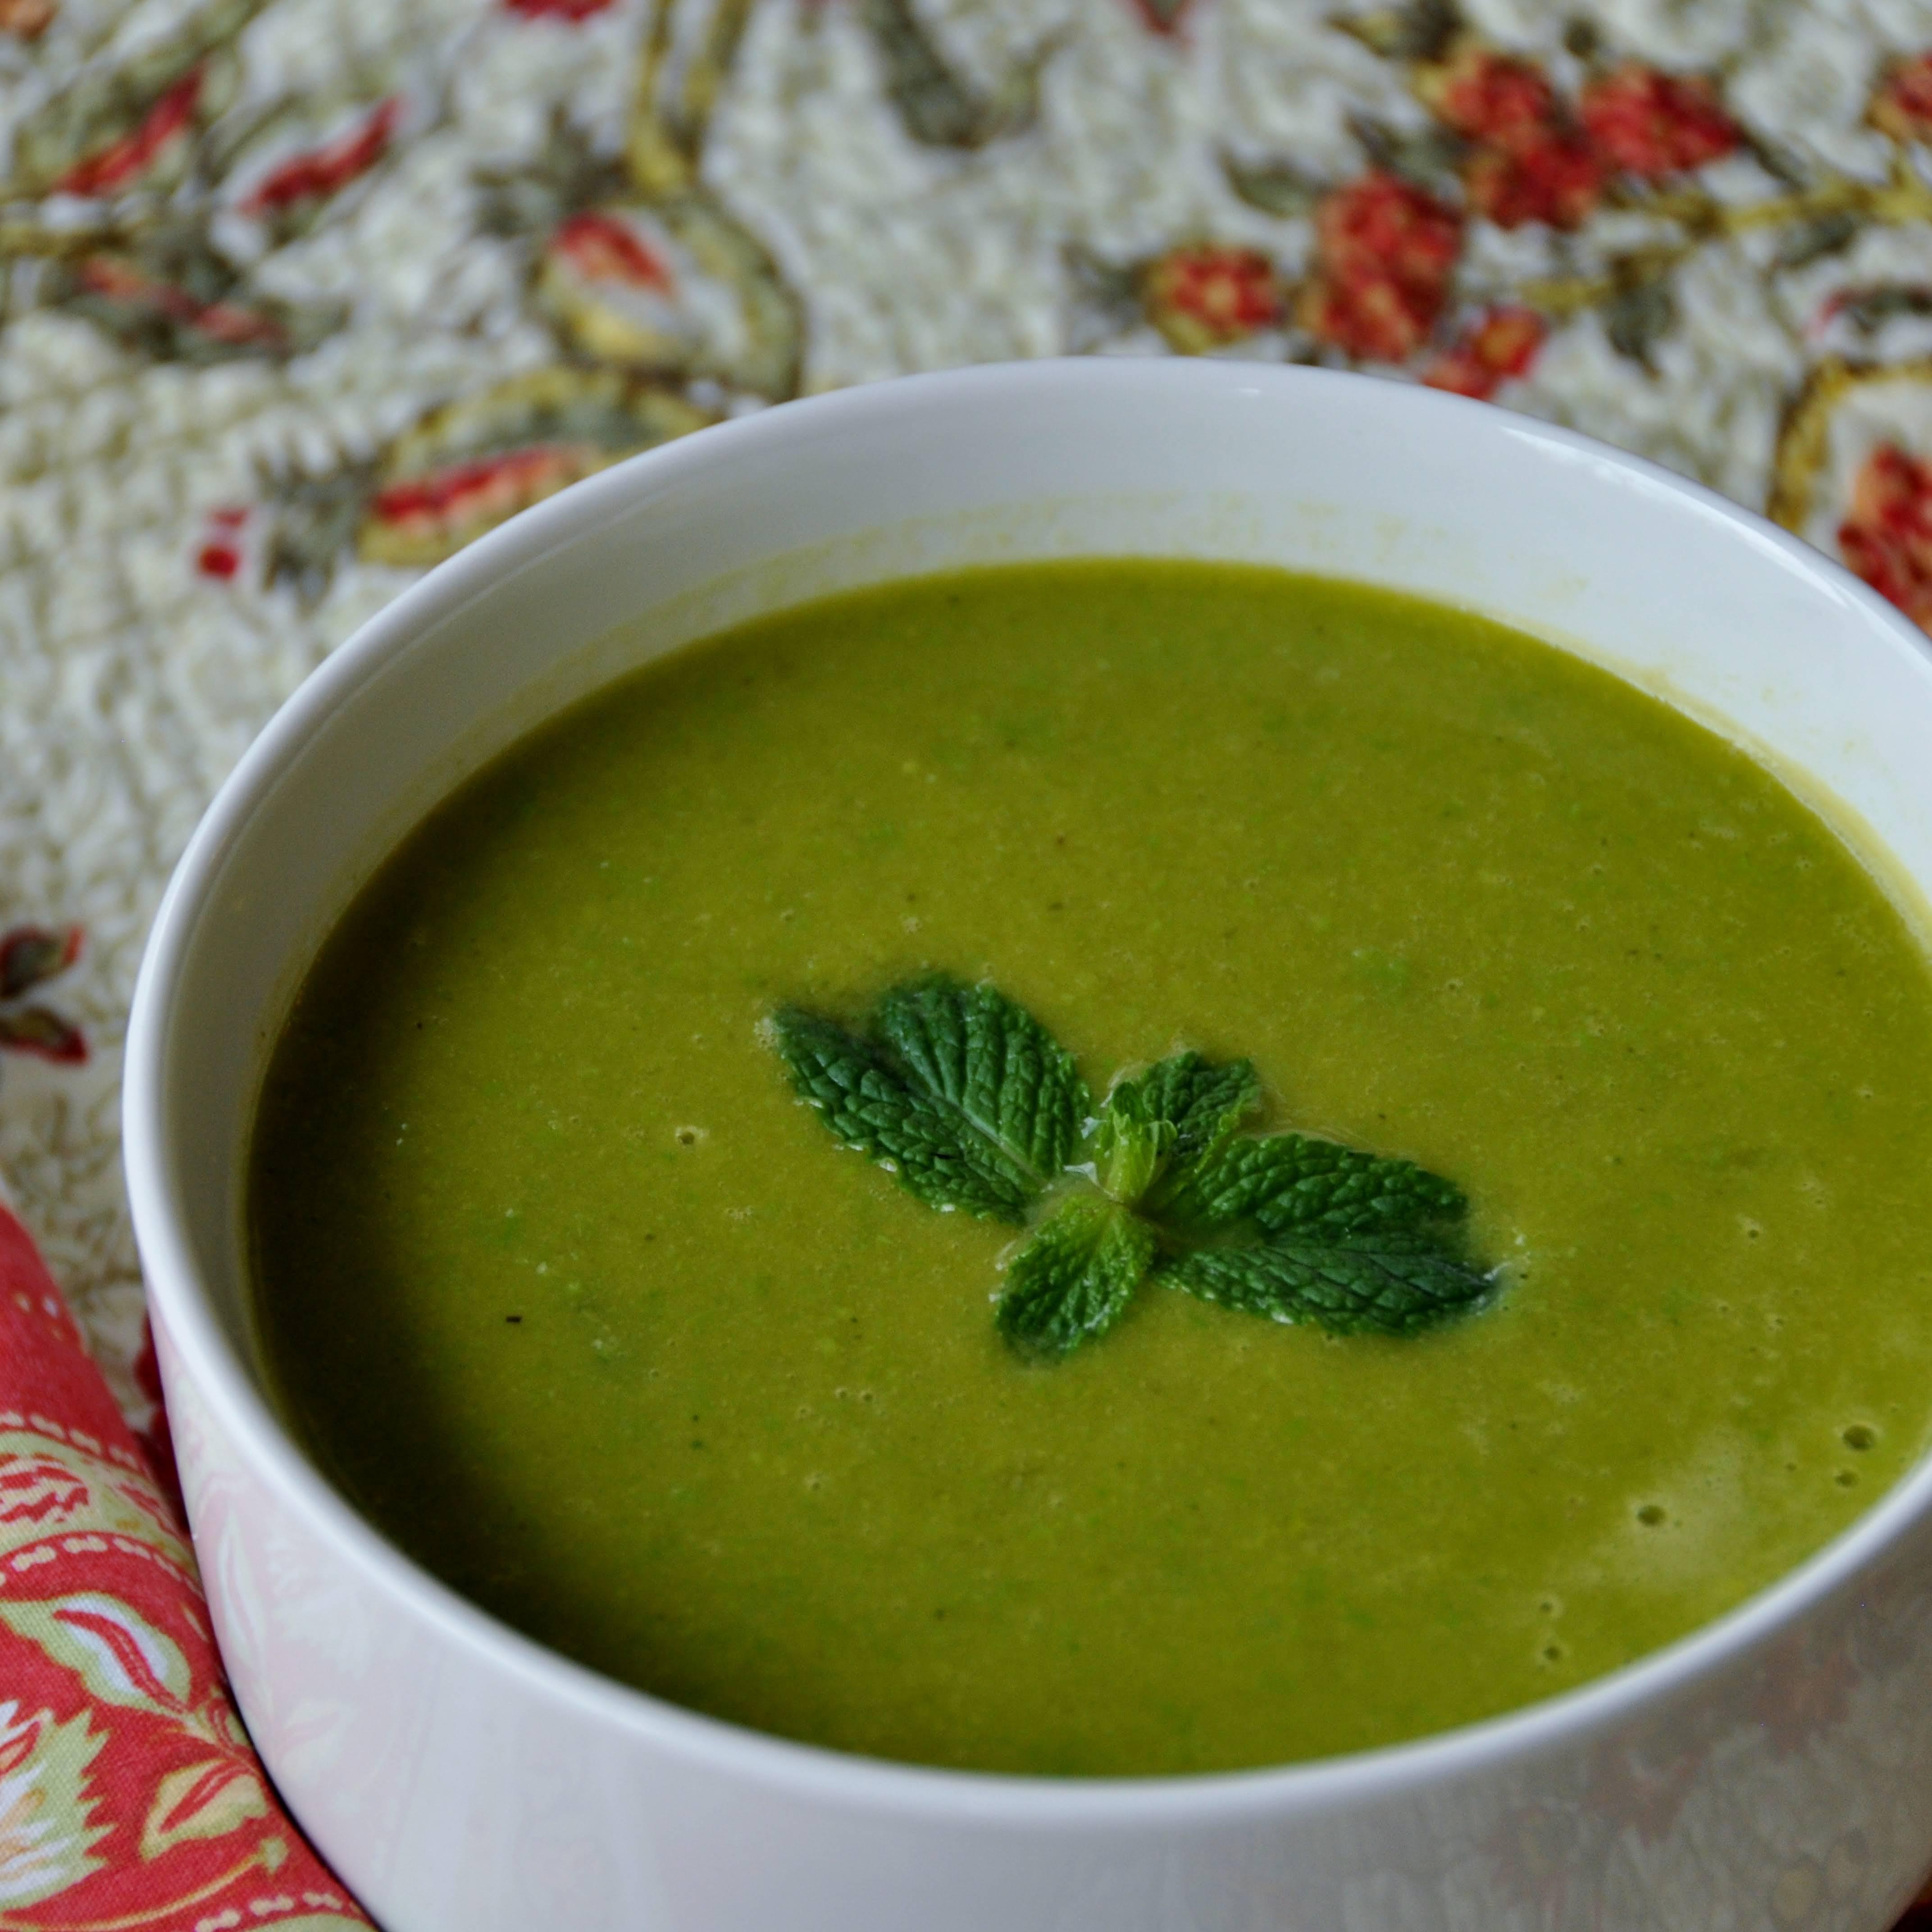 Minted English Pea Soup